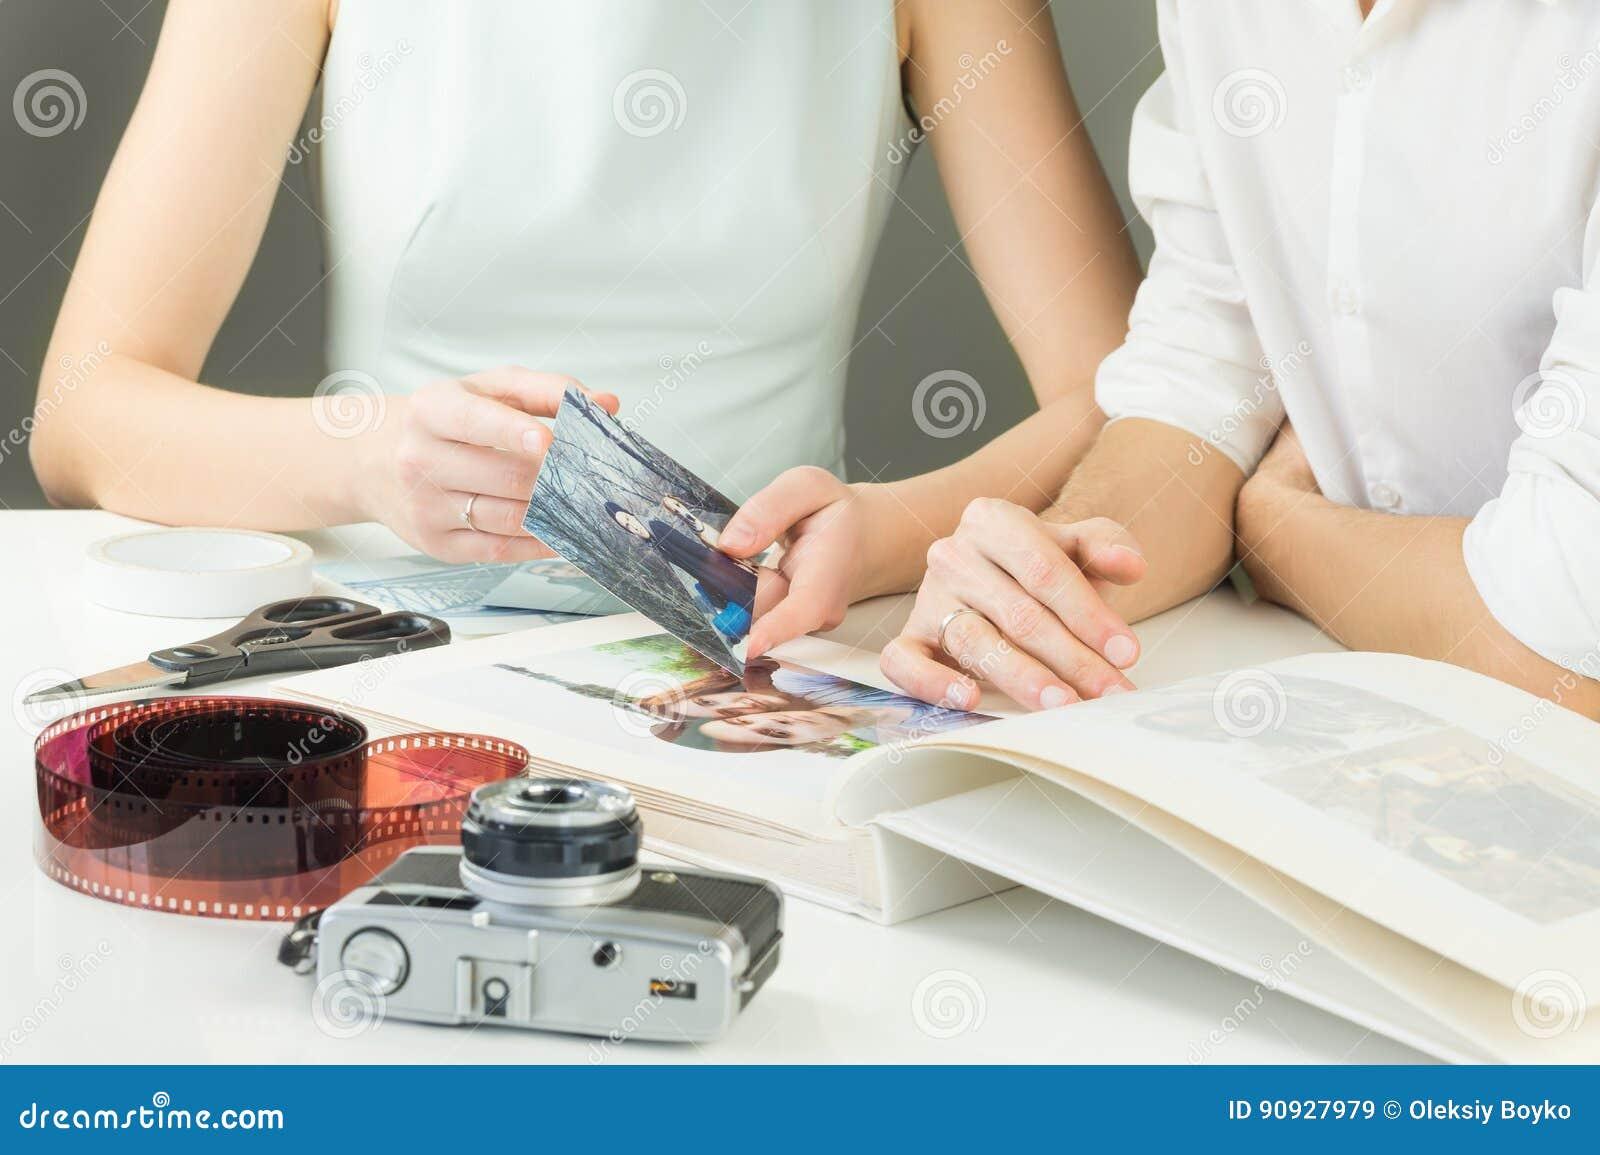 Fabrication du jeune album photos de famille